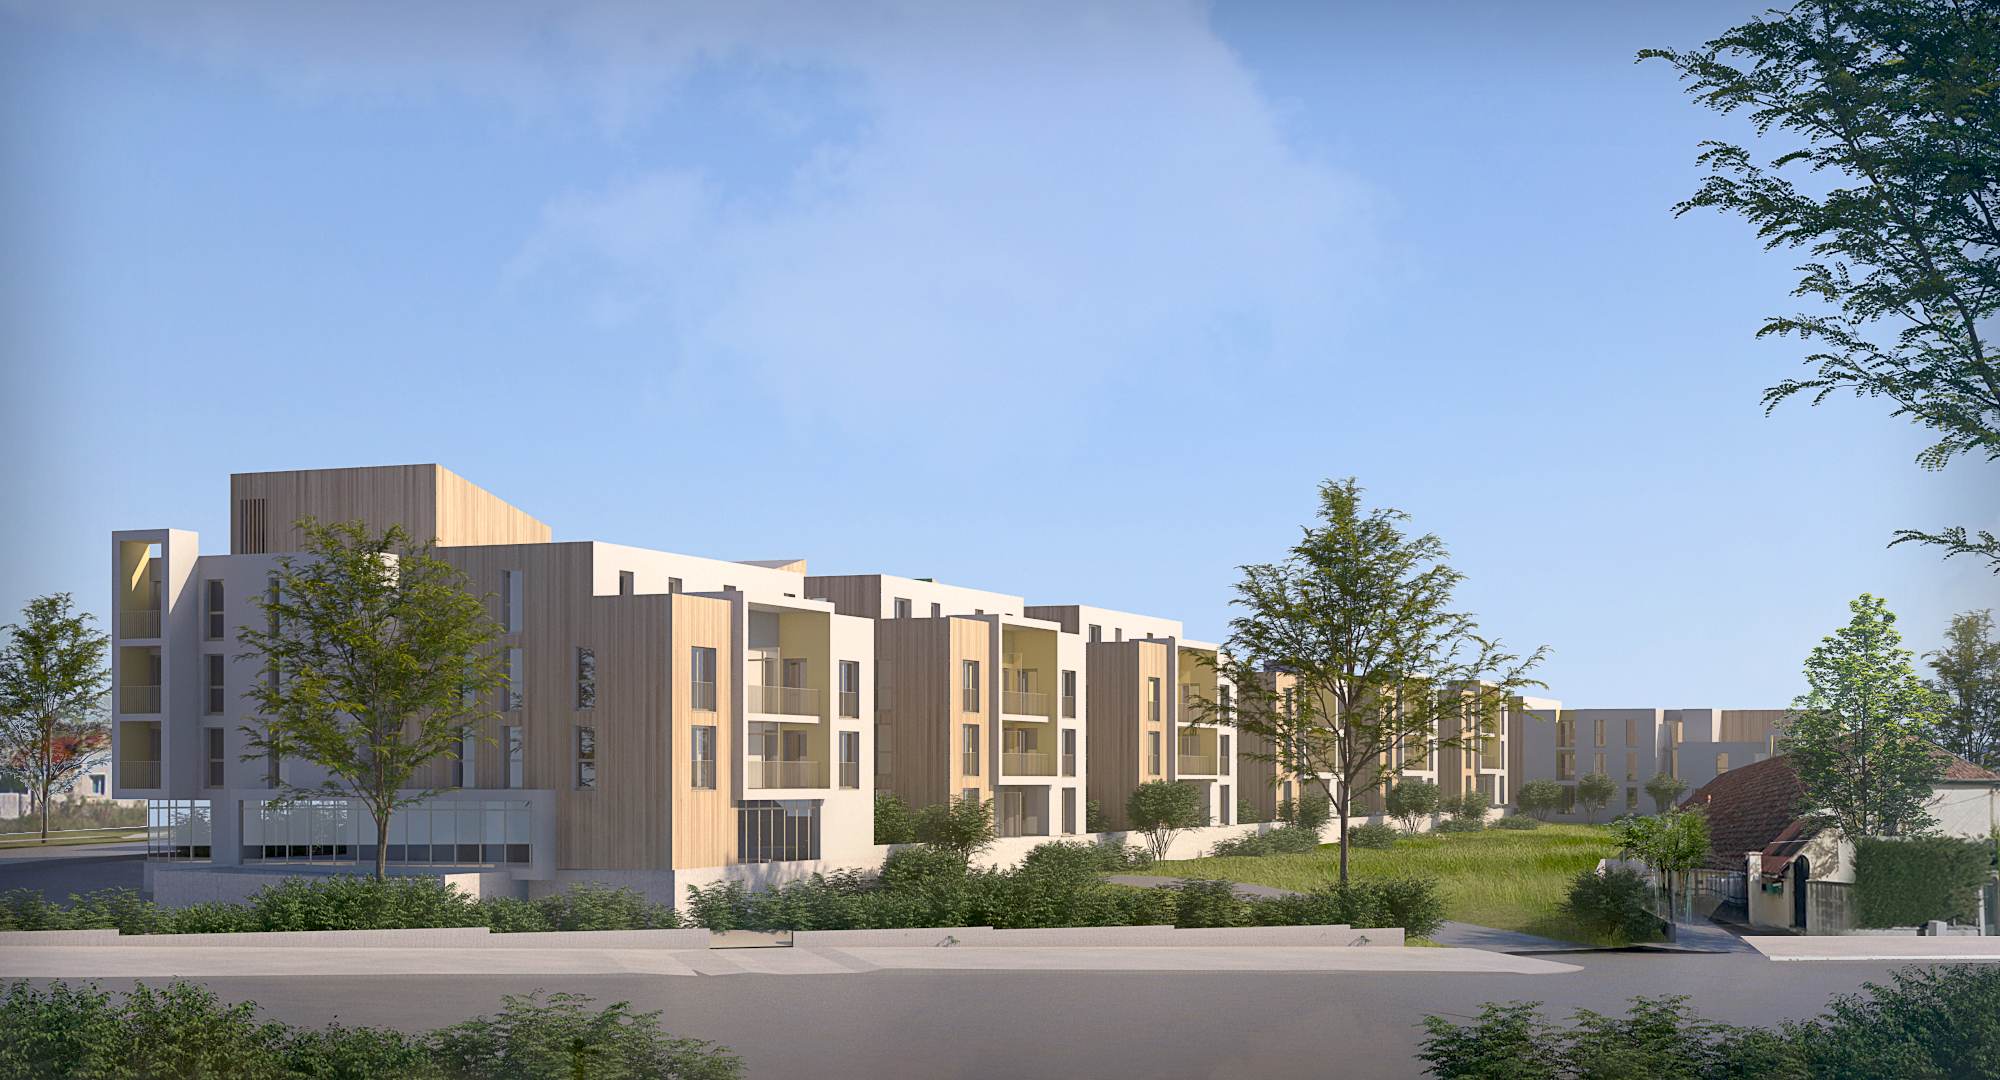 troyes_collective_housing_public_outdoor_design_christophe_gautrand_landscape_3.jpg